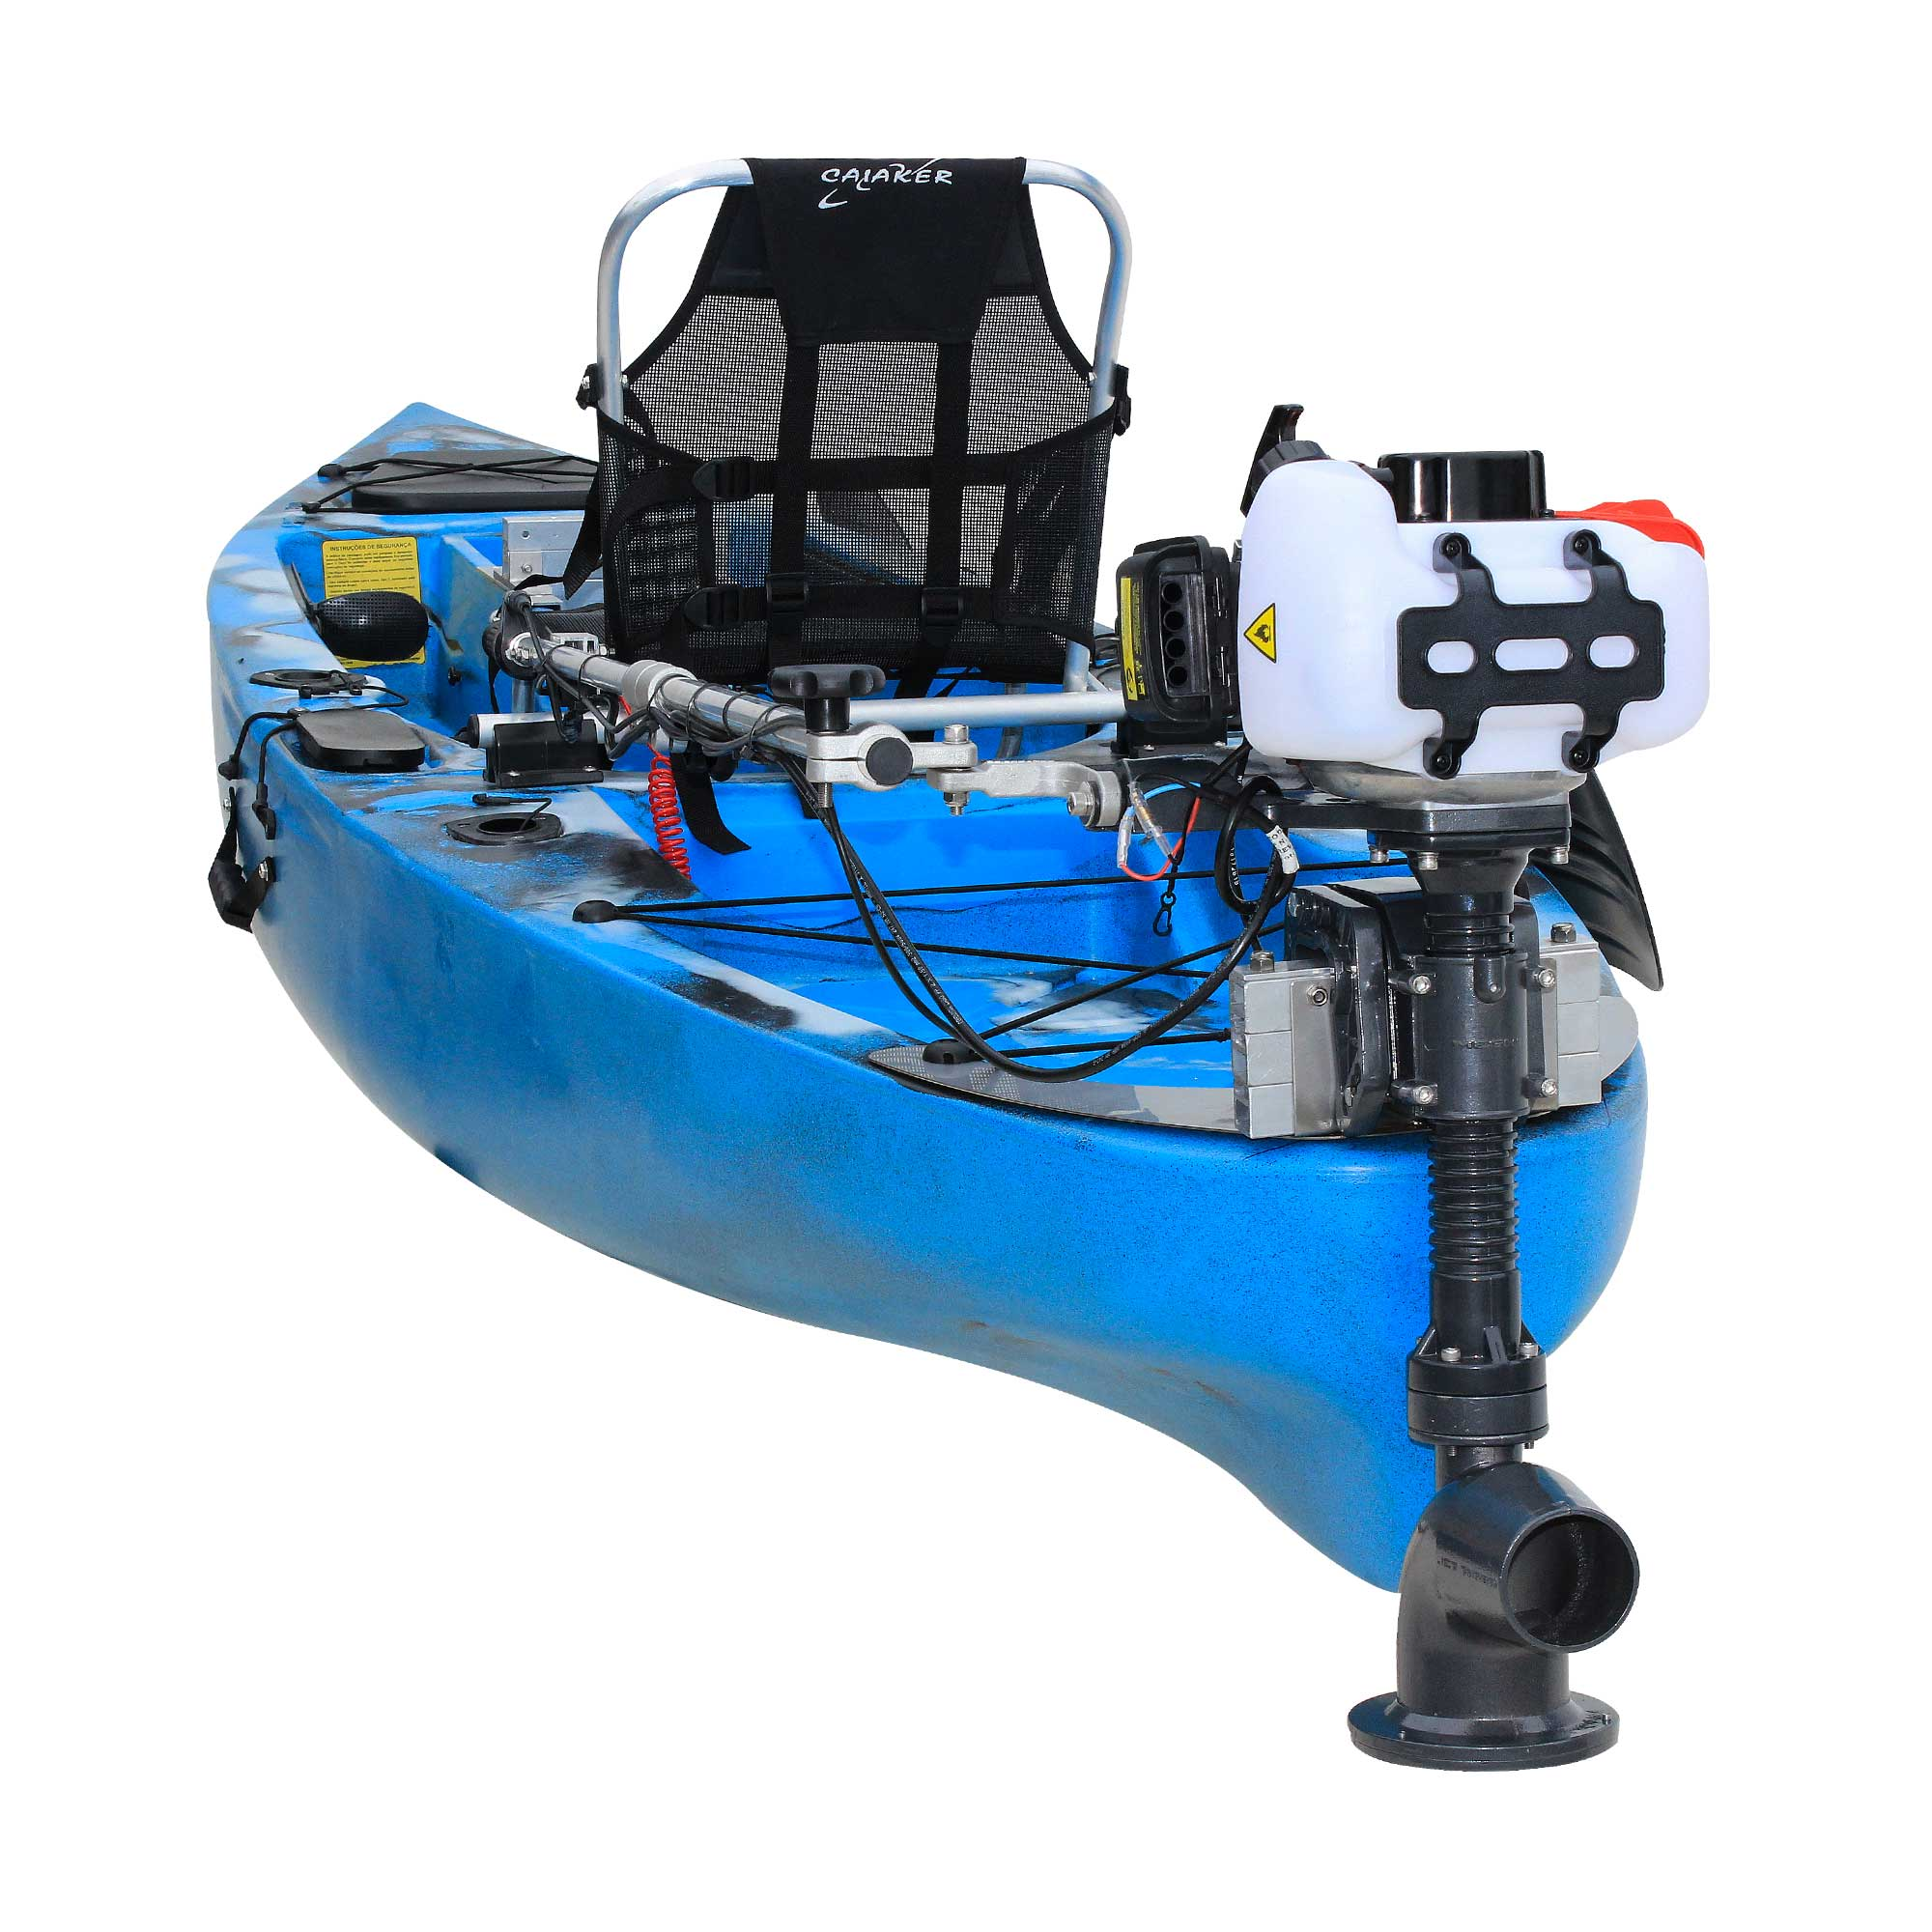 Kit Jet Turbo Cut Pantaneiro + acelerador remoto + Suporte traseiro Marlim